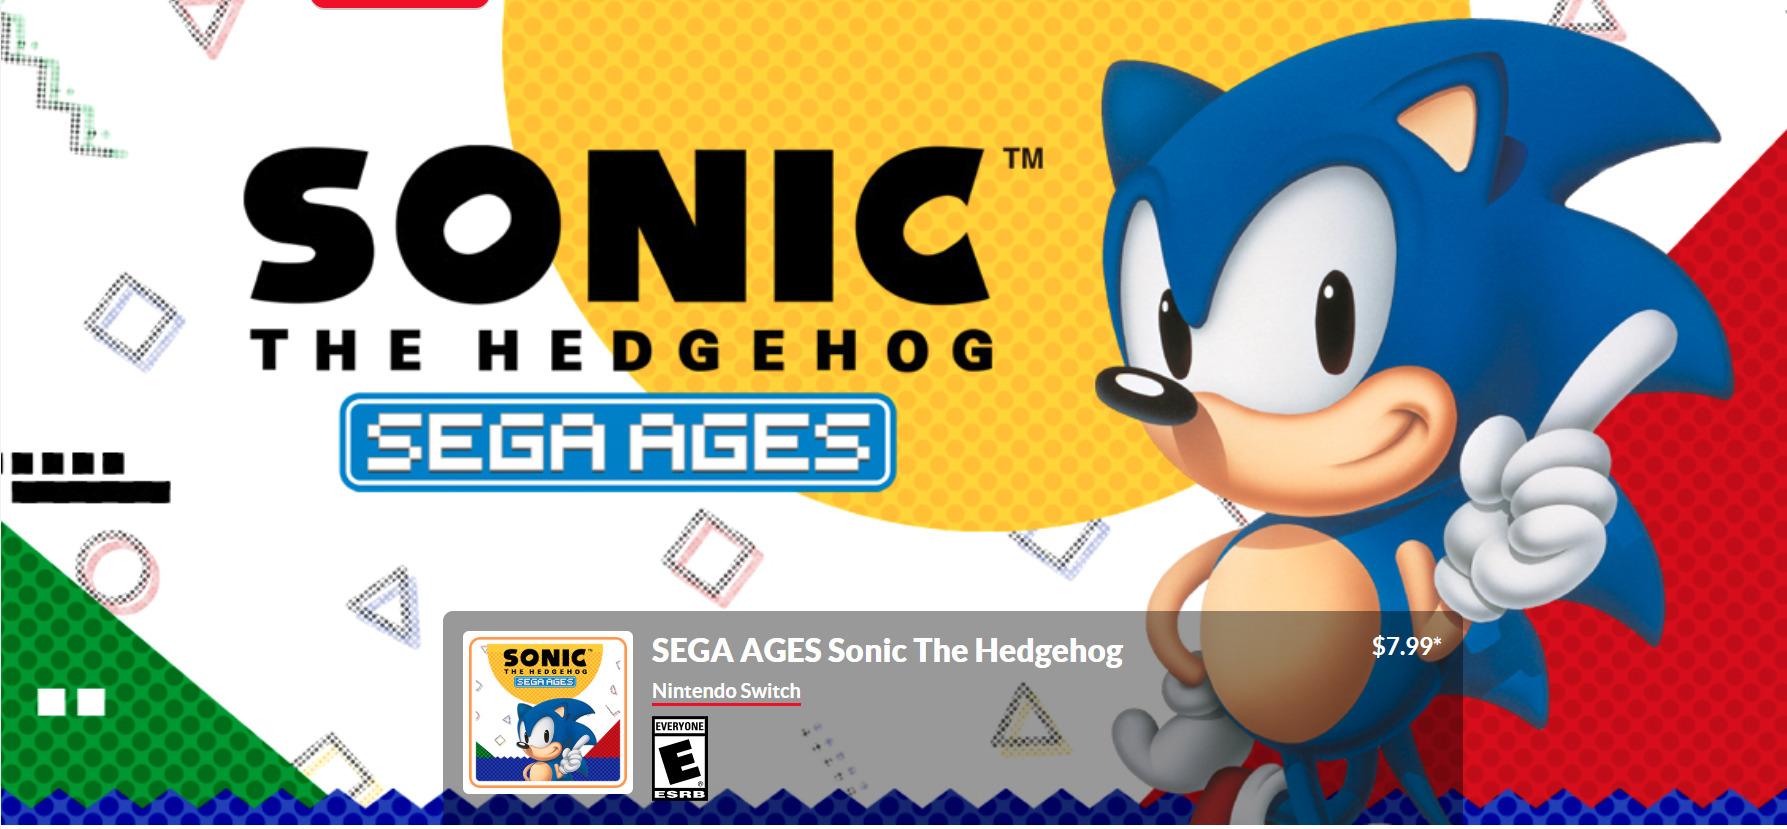 Exa Arcadia Supports Release Of Sonic The Hedgehog On Nintendo Switch Exa Arcadia